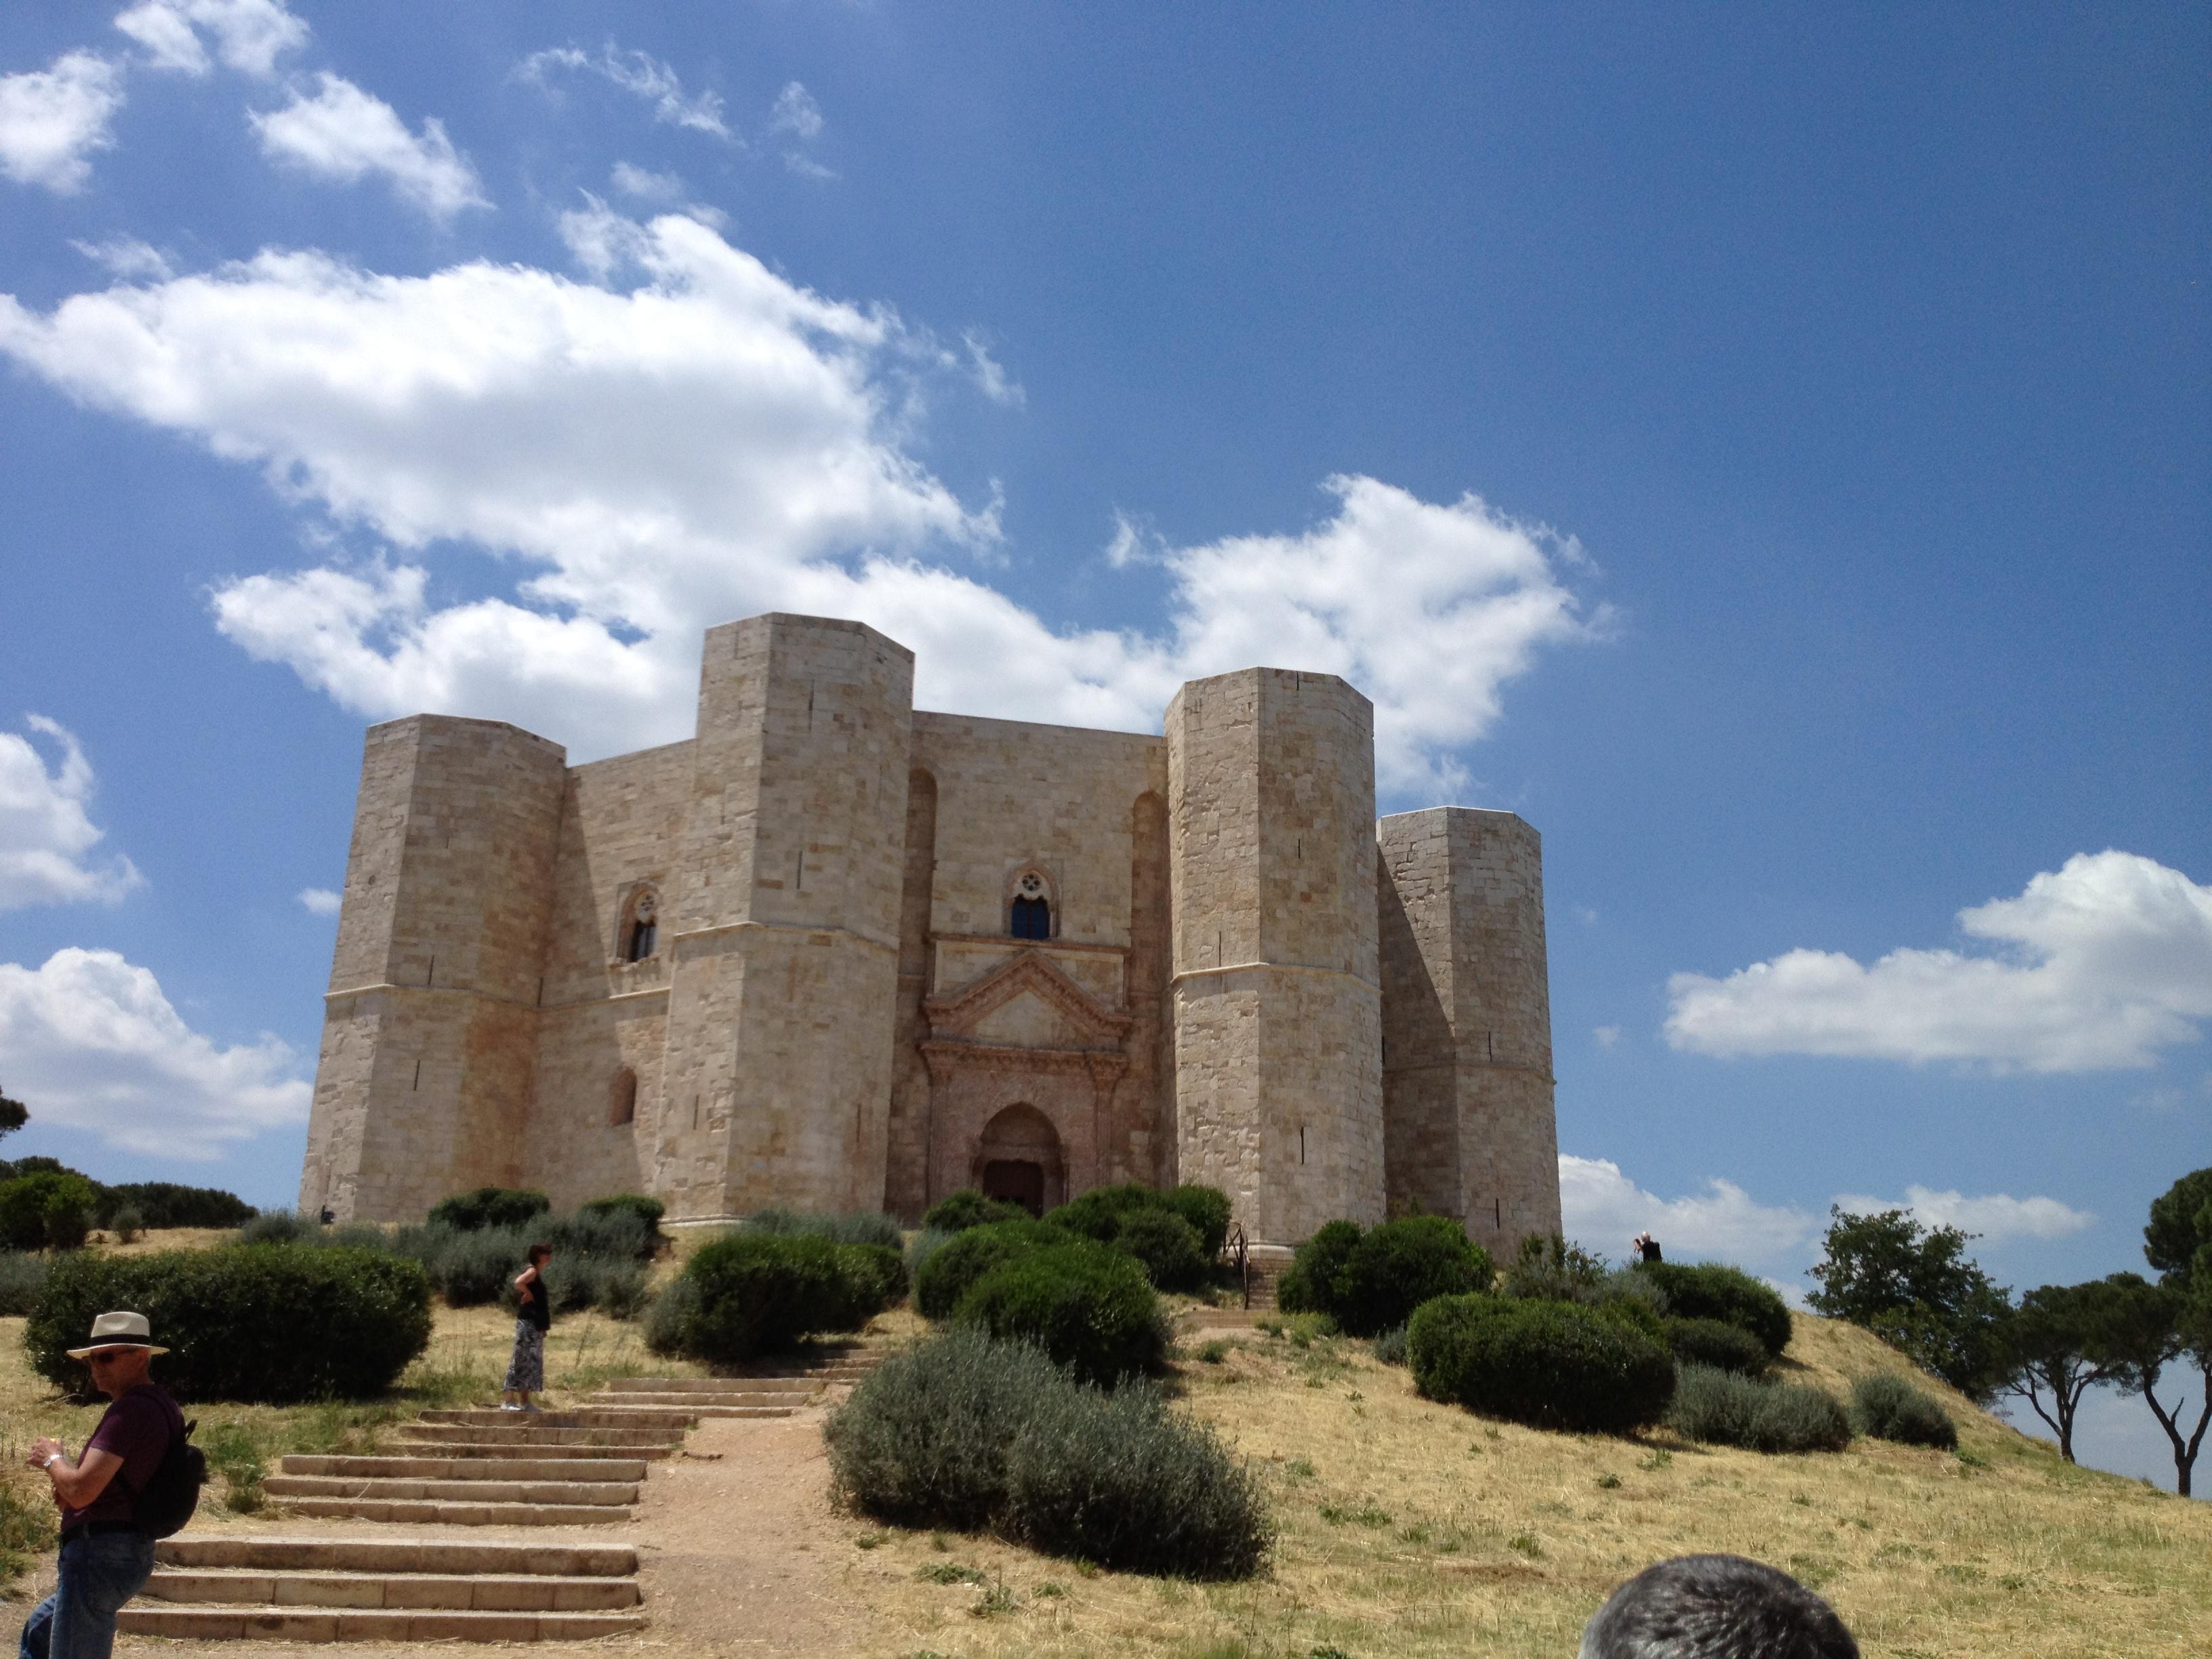 castel del monte - photo #34